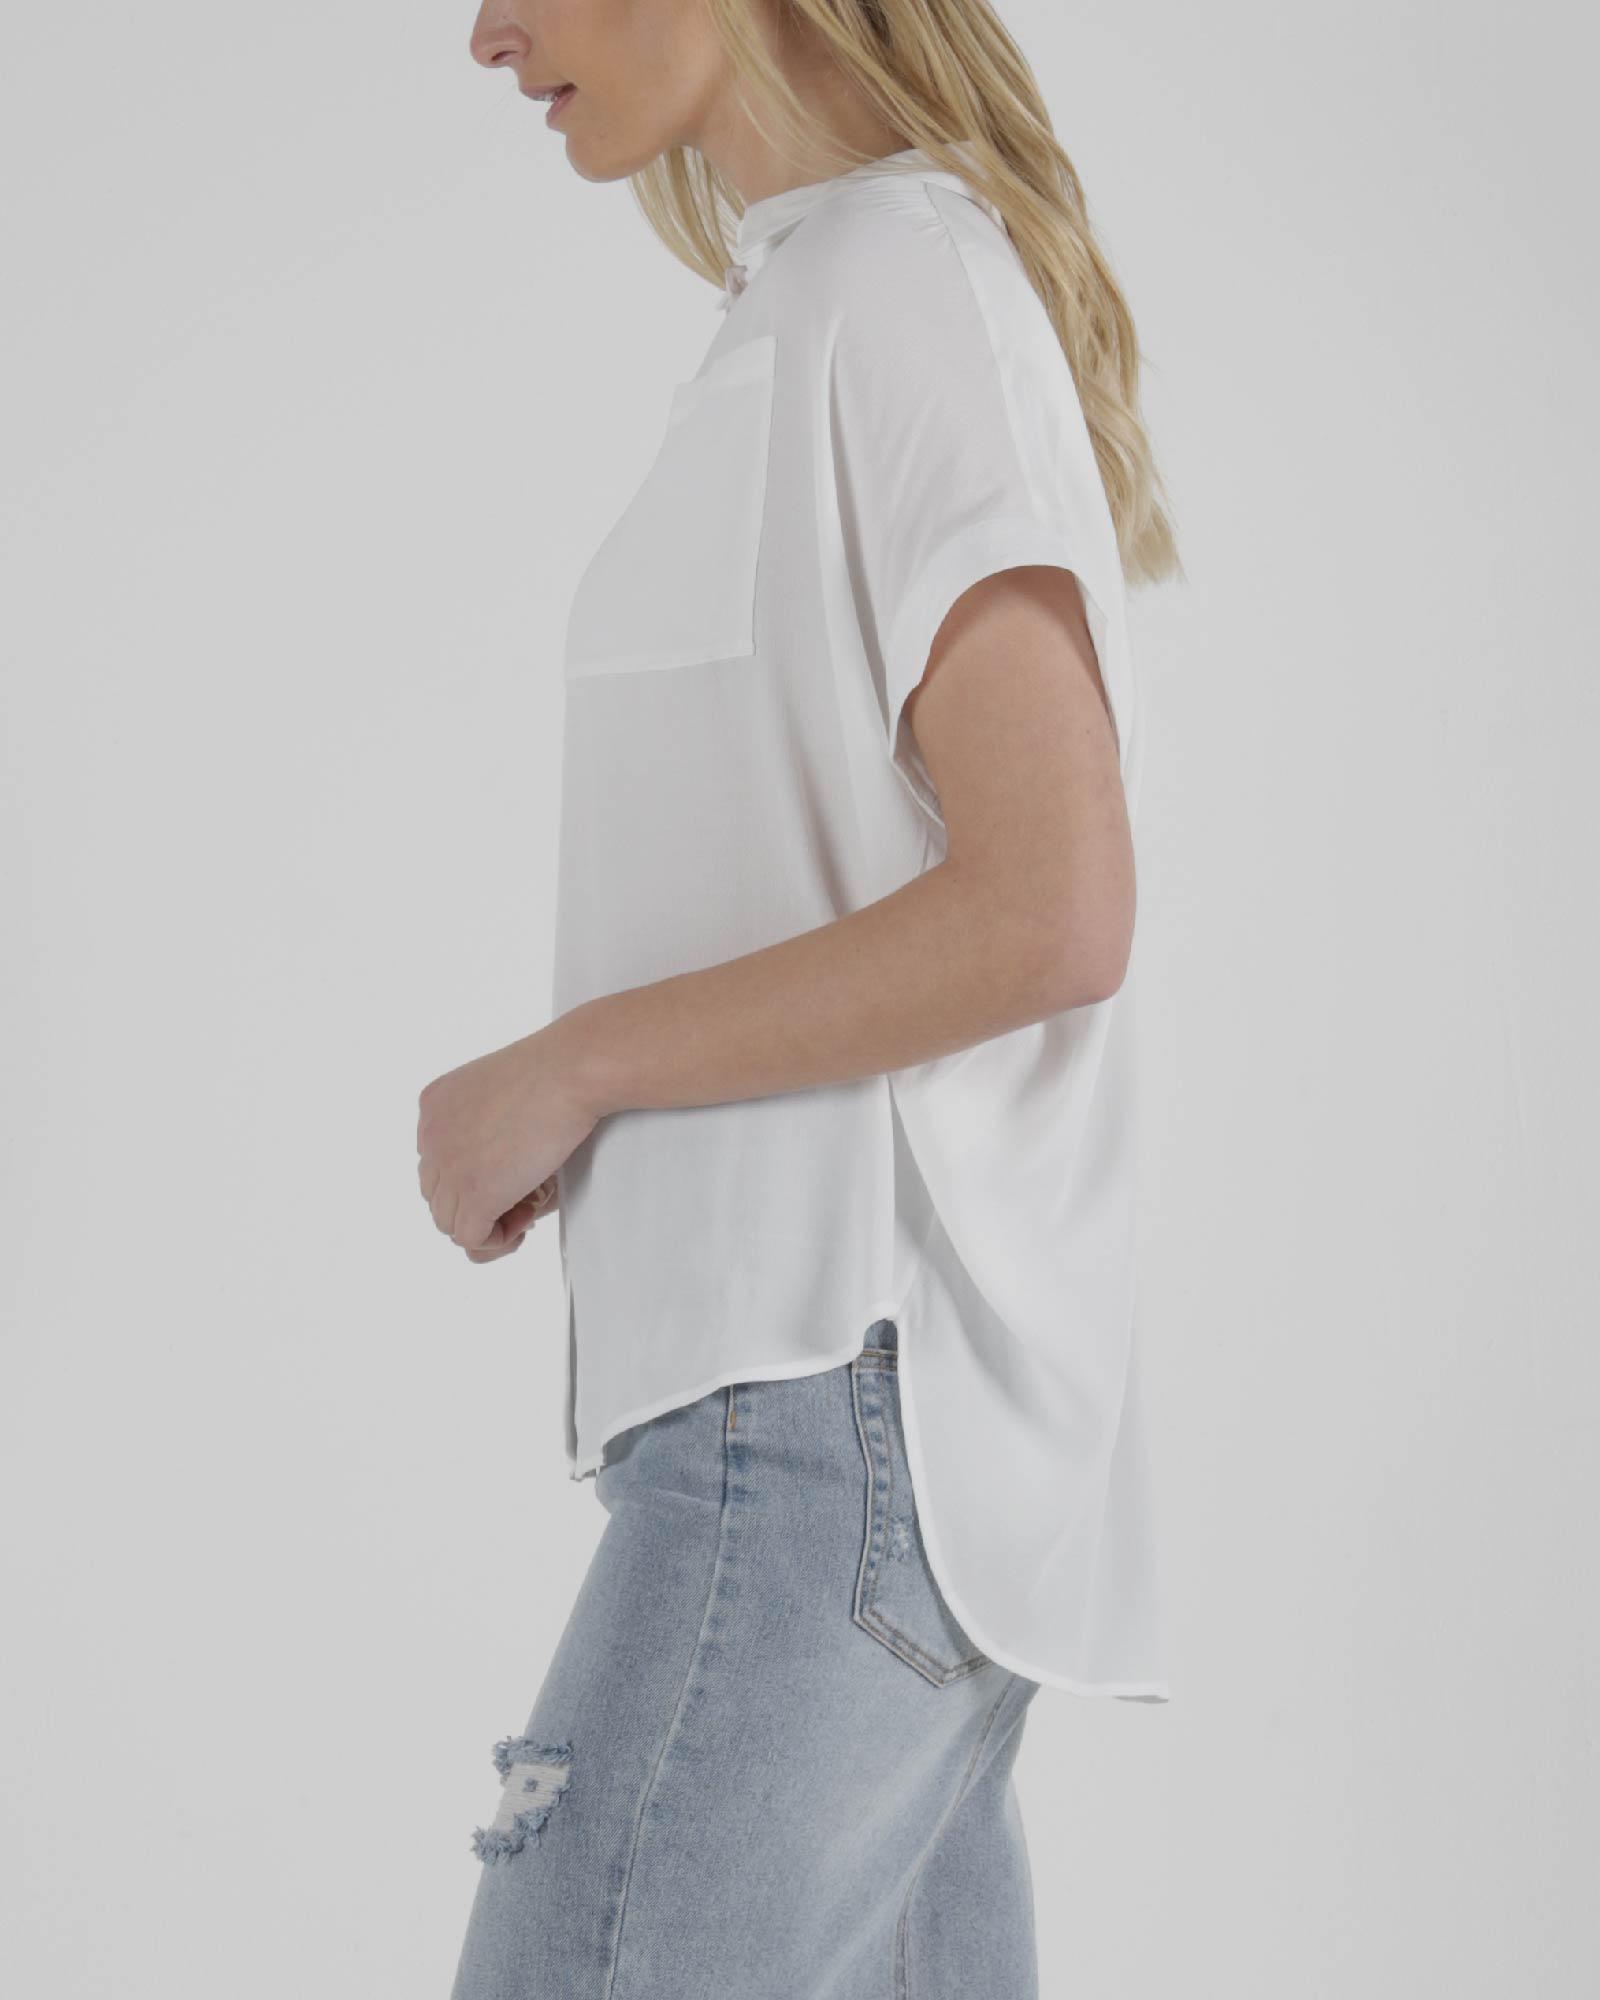 Sass Camille Shirt White